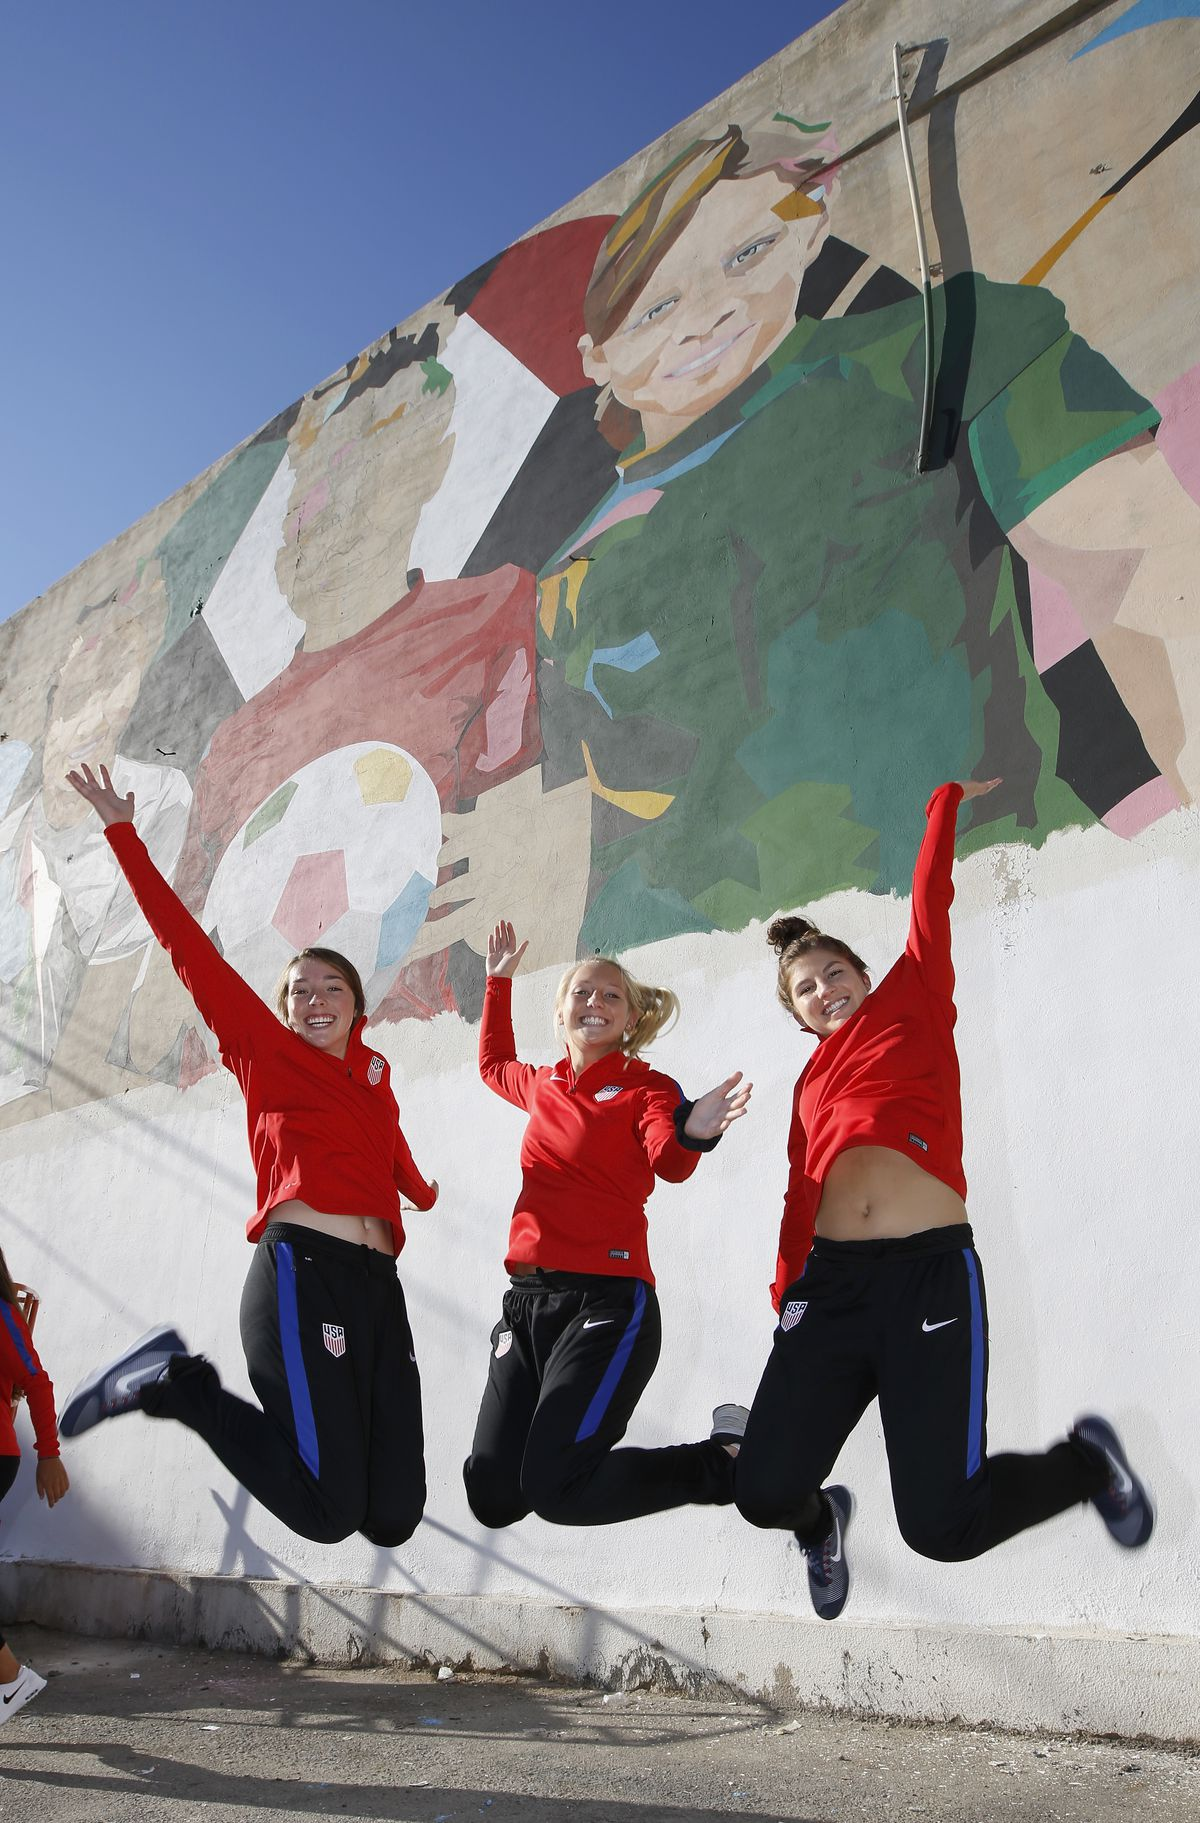 Previews - FIFA U-17 Women's World Cup Jordan 2016